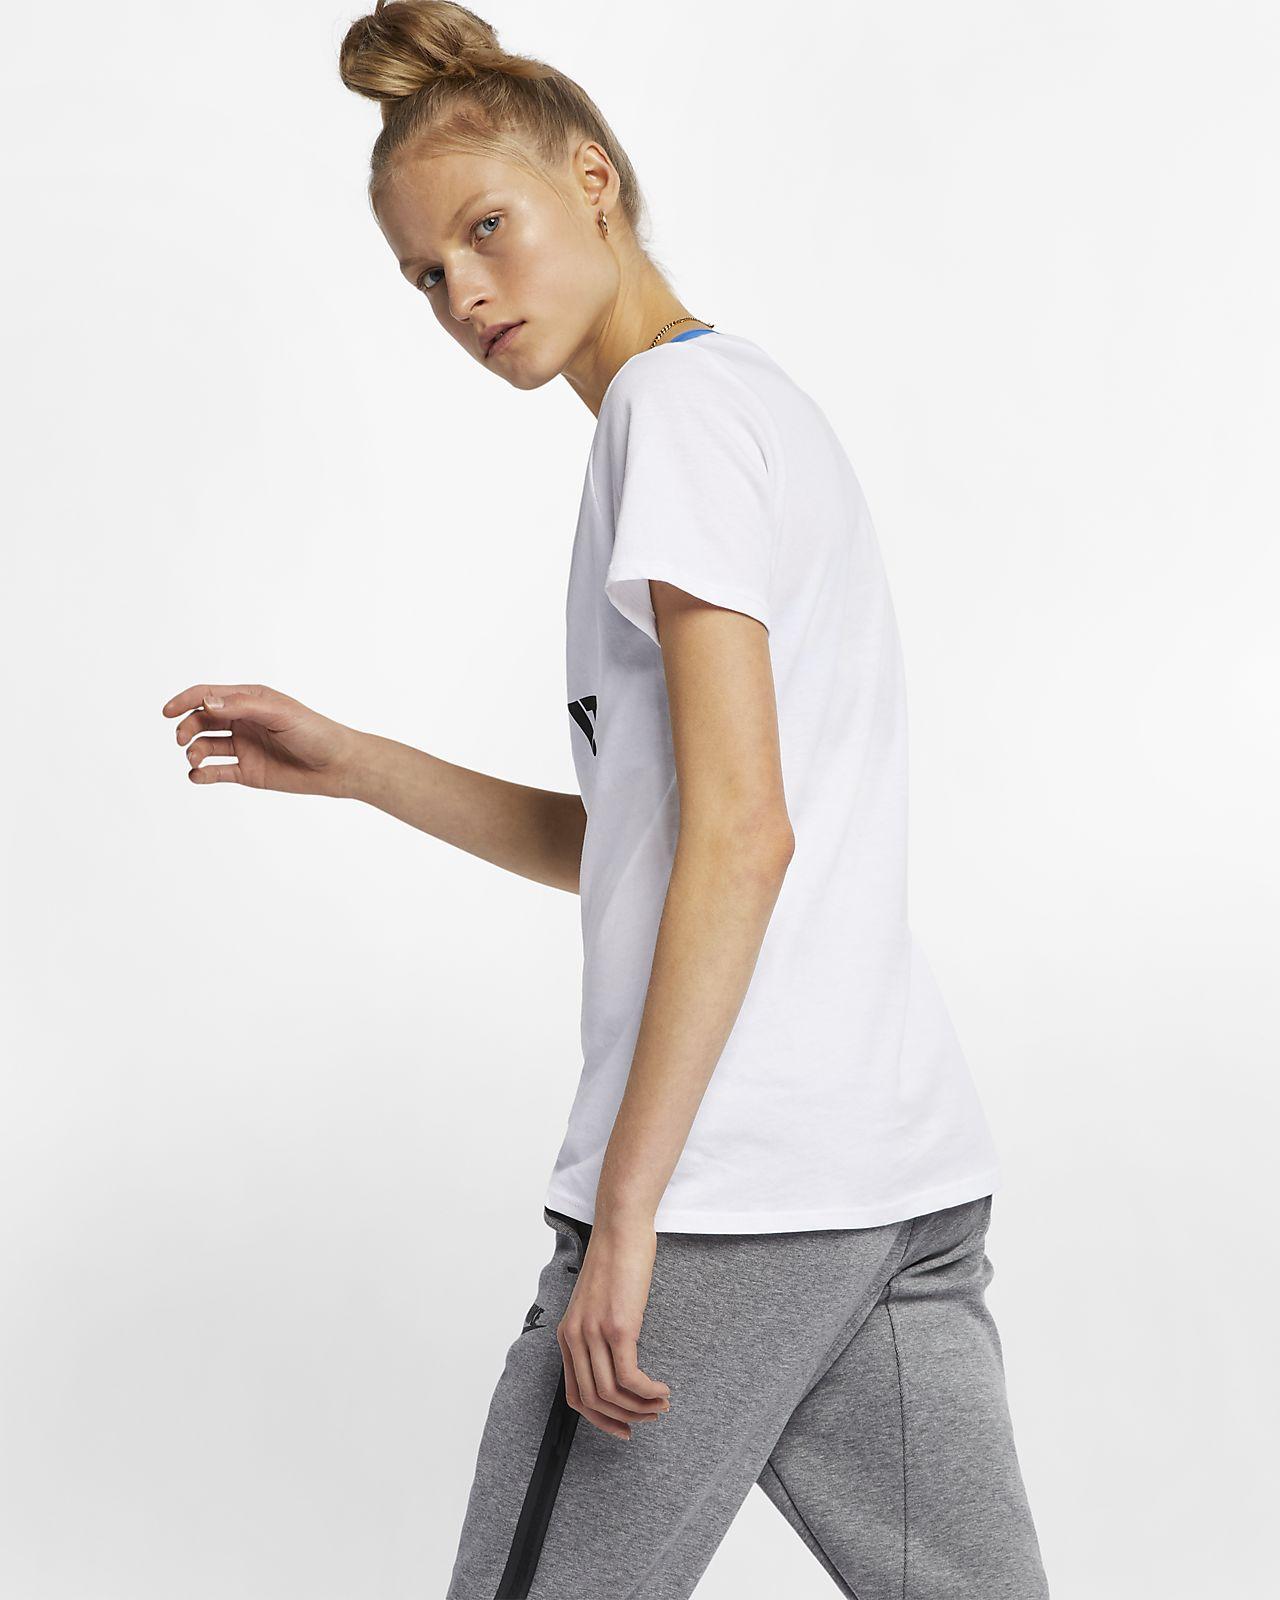 Nike City (Paris) Women's T Shirt